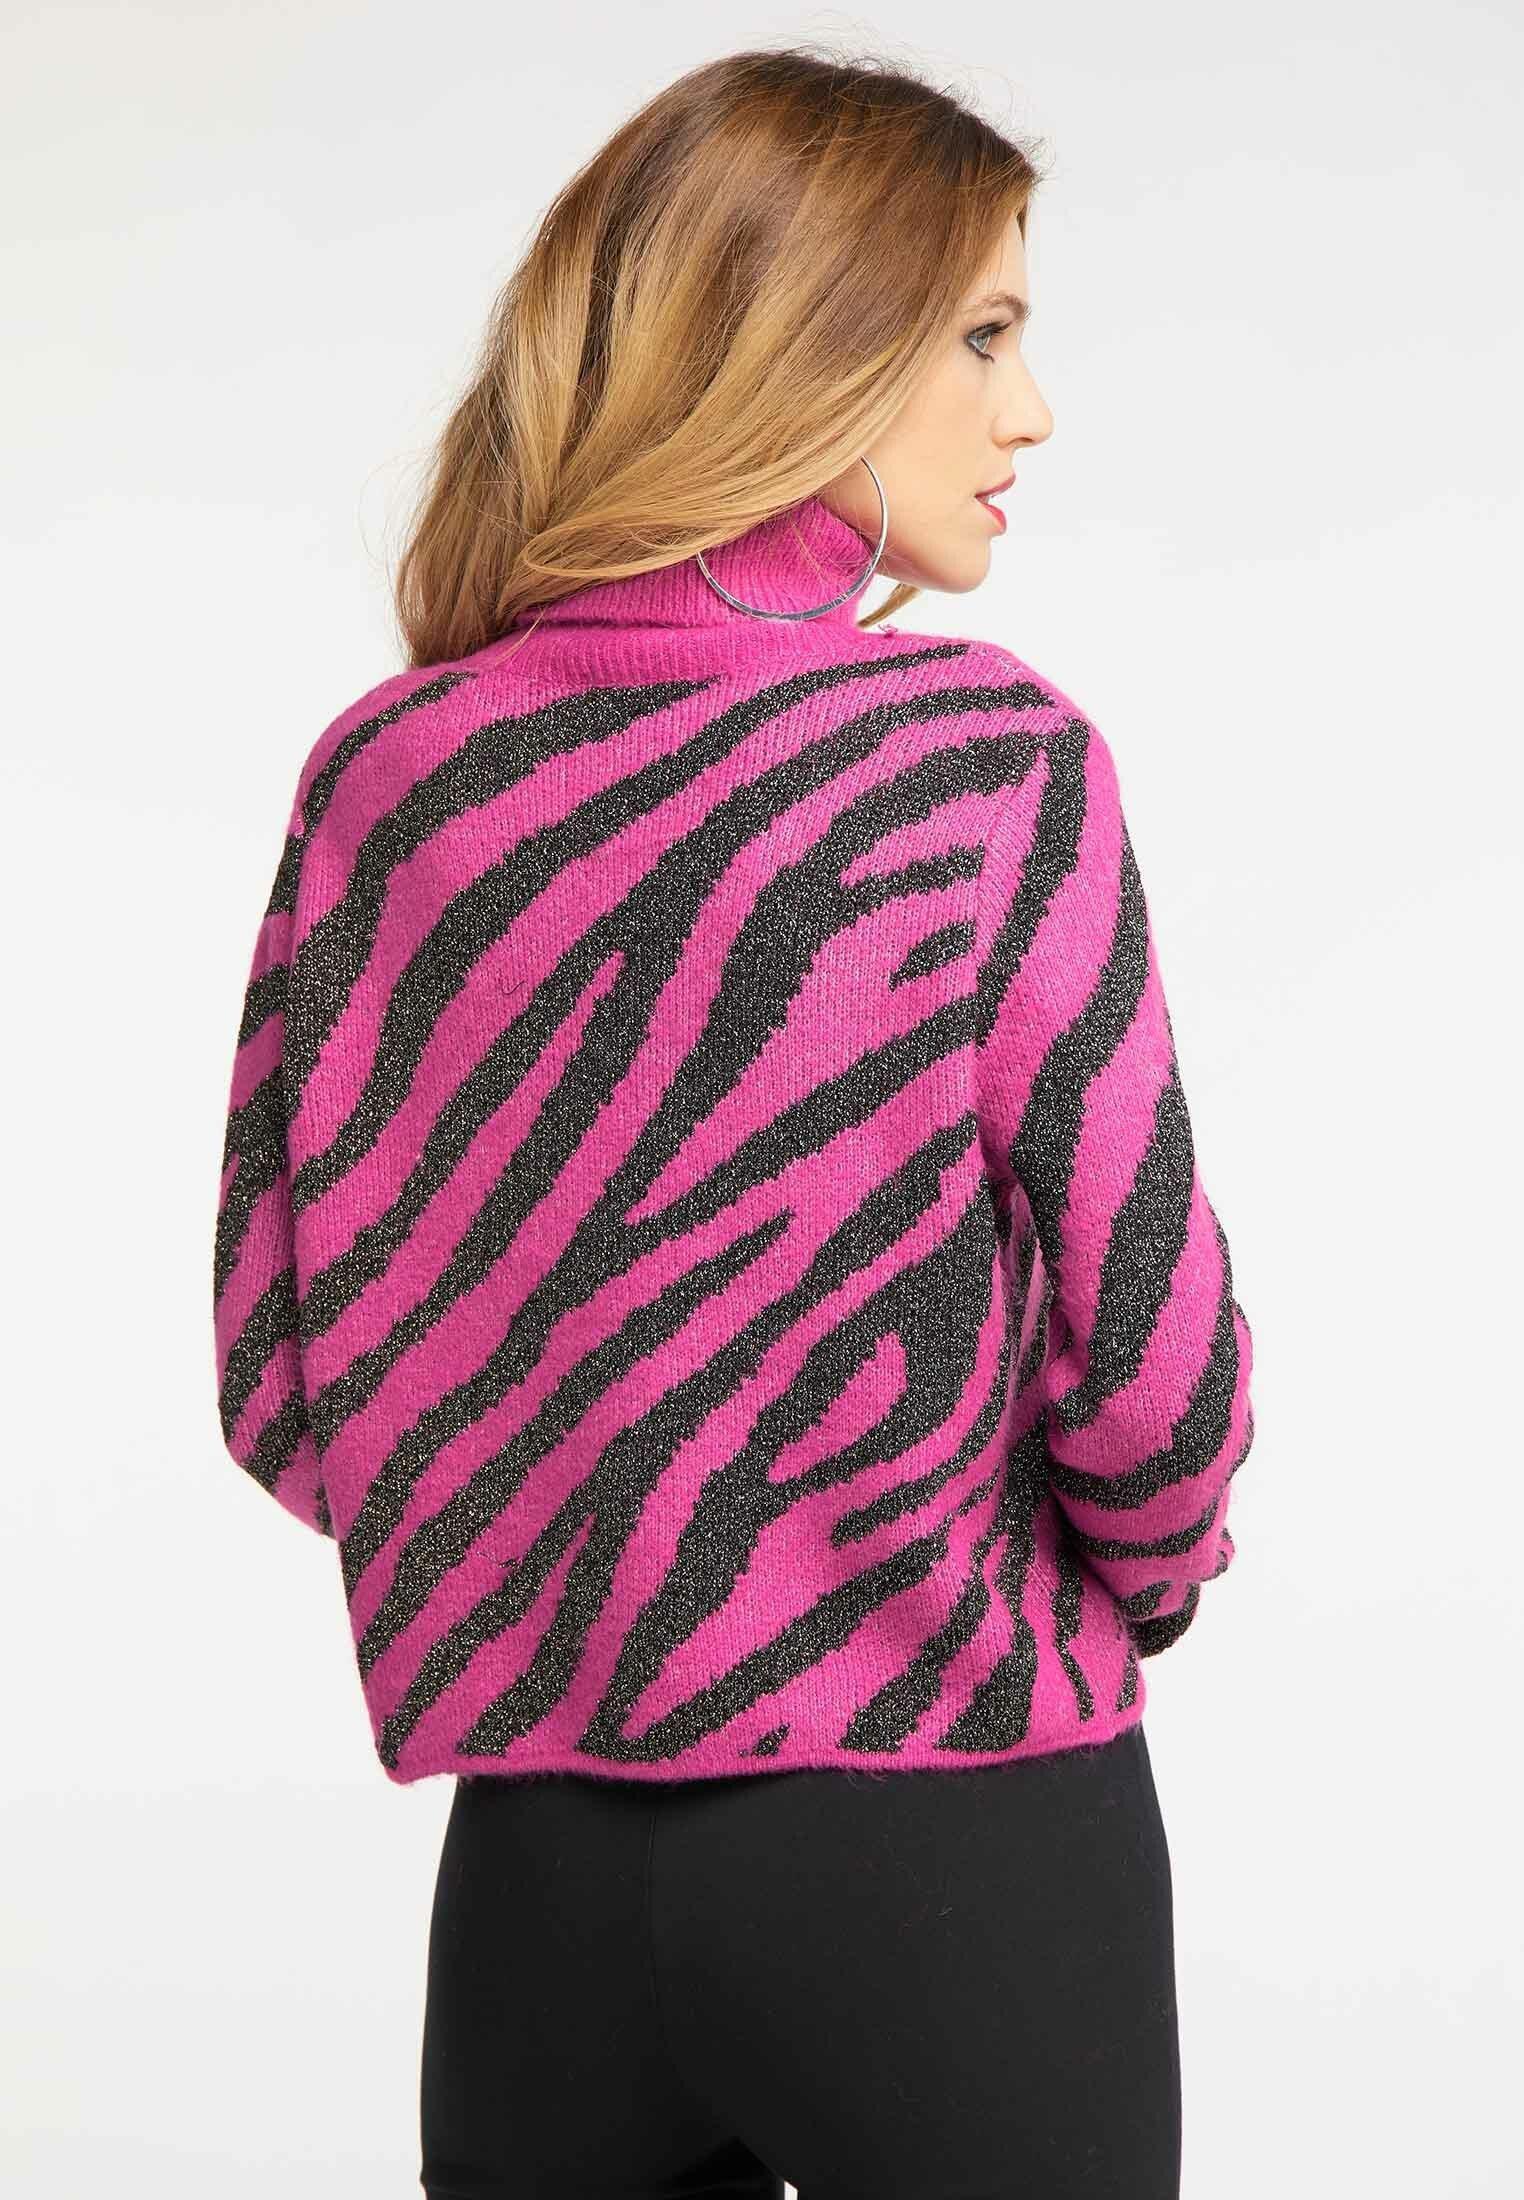 Cut-Price Women's Clothing faina Jumper pink yGrsRlhKV